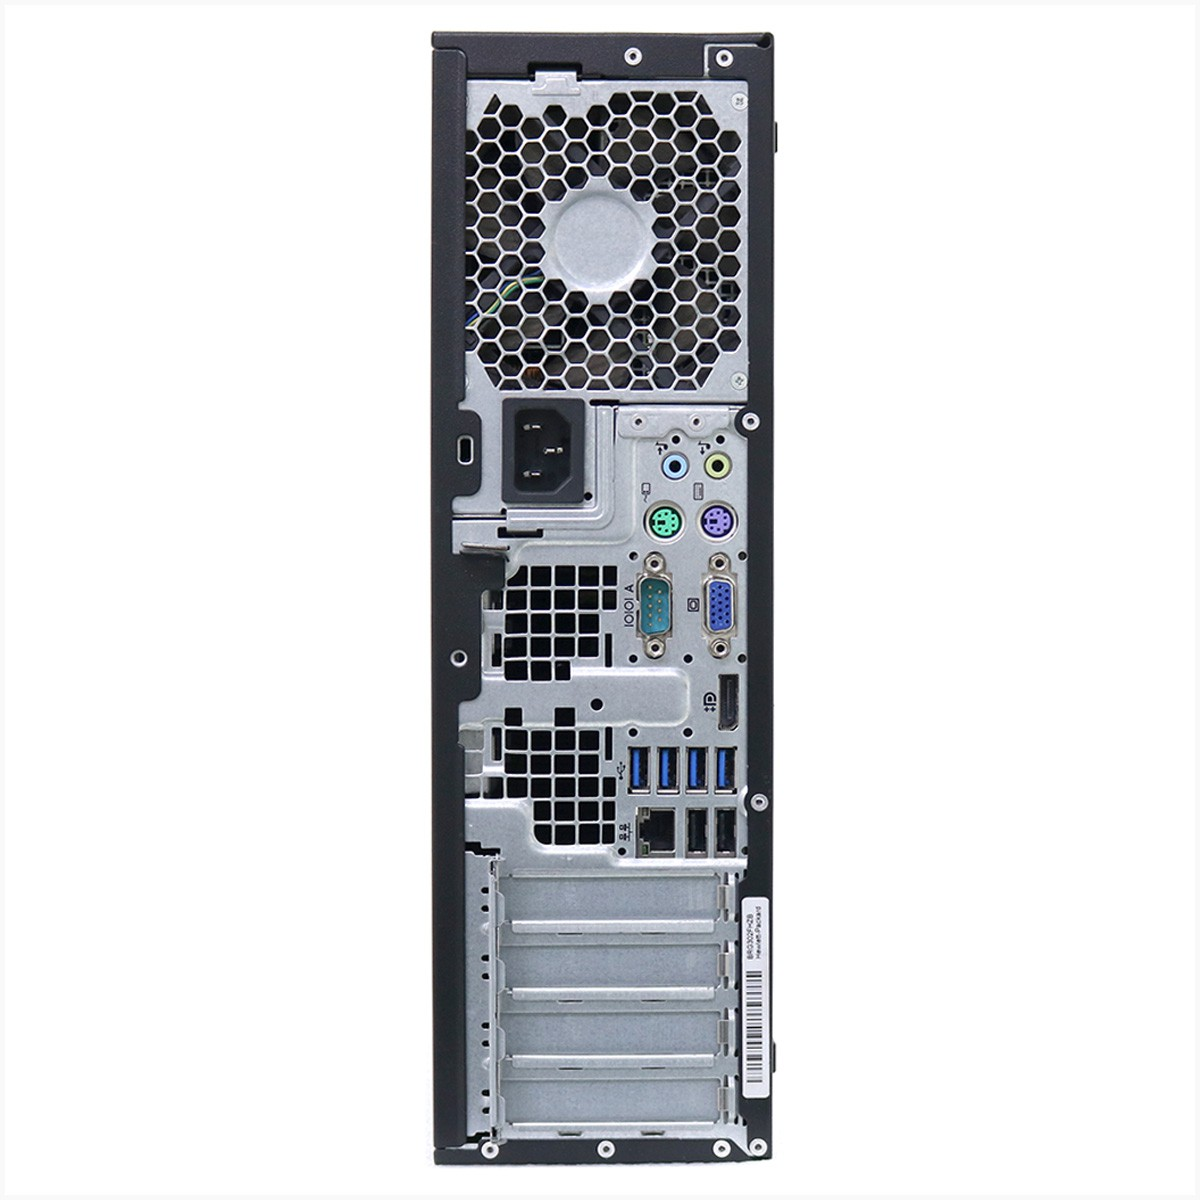 Desktop Hp Compaq 8300 i7 4gb 500gb - Usado